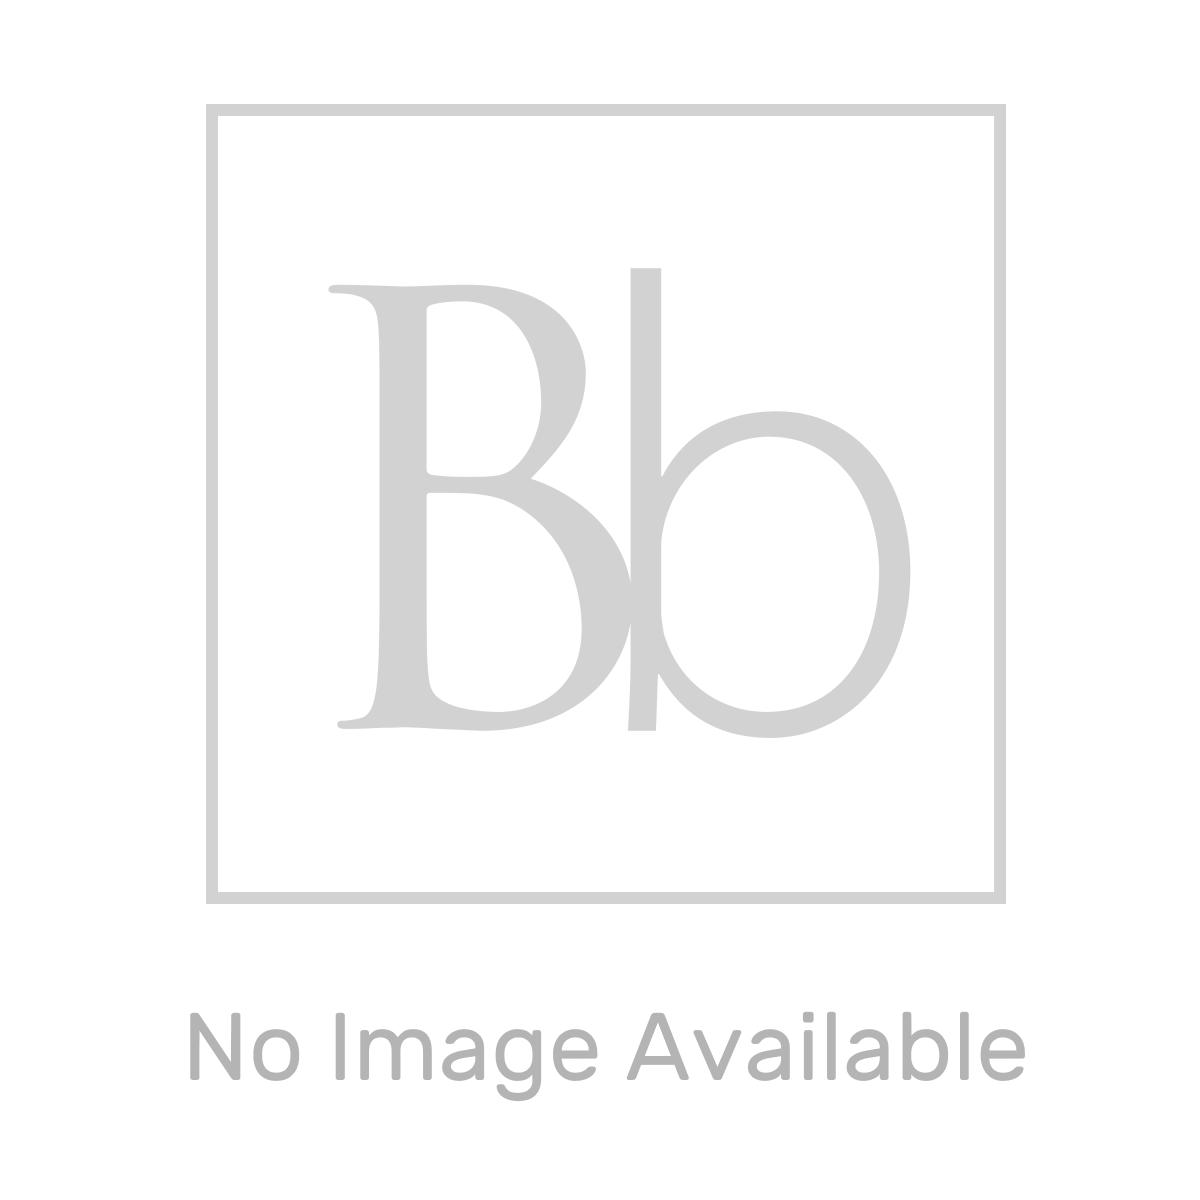 Sensio Madison LED Up/Down Wall Light